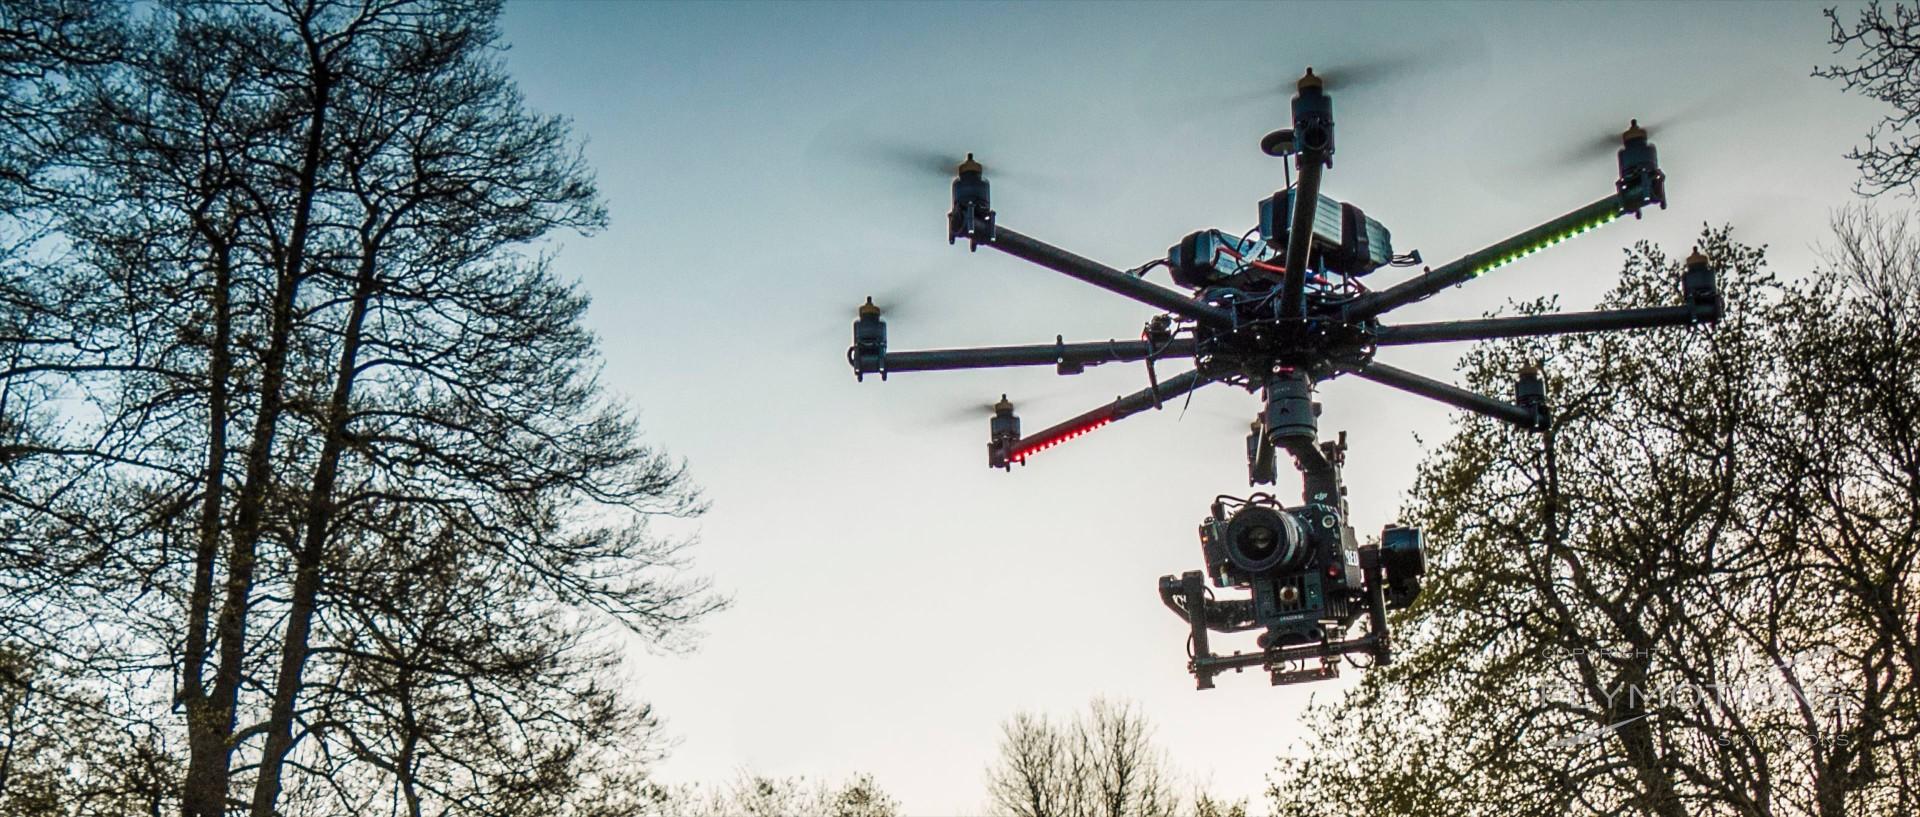 drohne-cinestar8-oktokopter-reddragon Luftaufnahmen